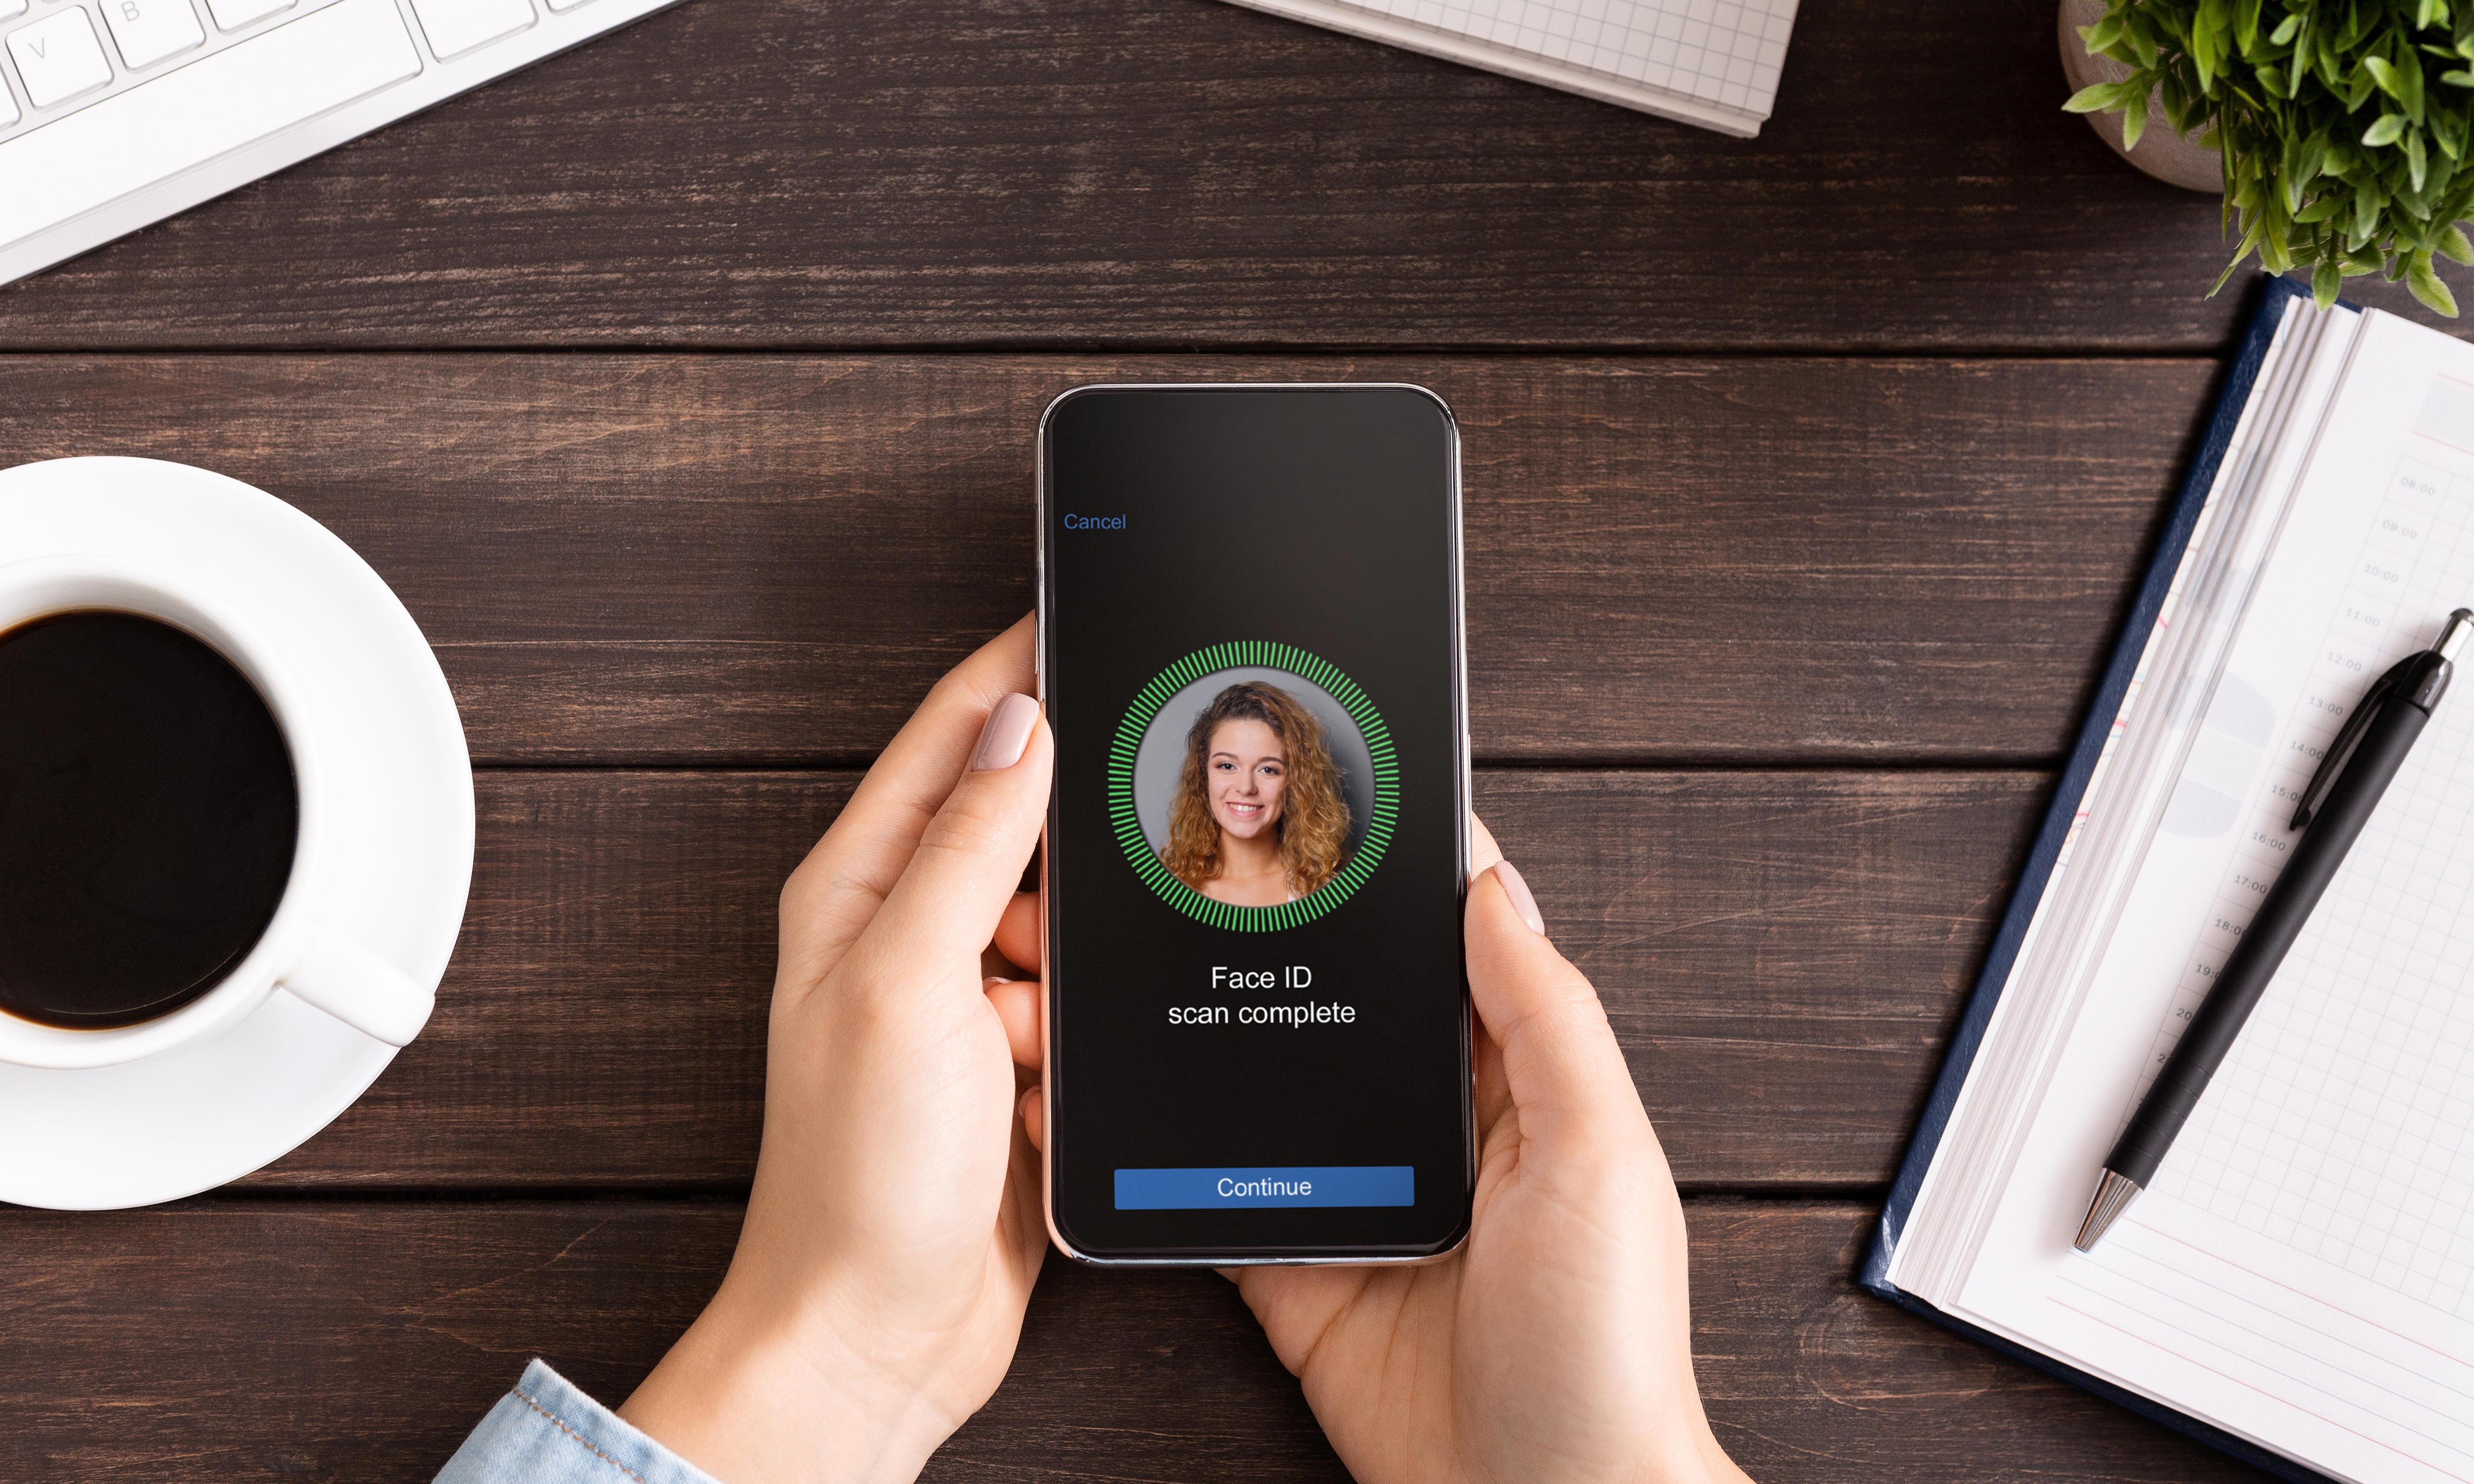 Facial recognition is big tech's latest toxic 'gateway' app